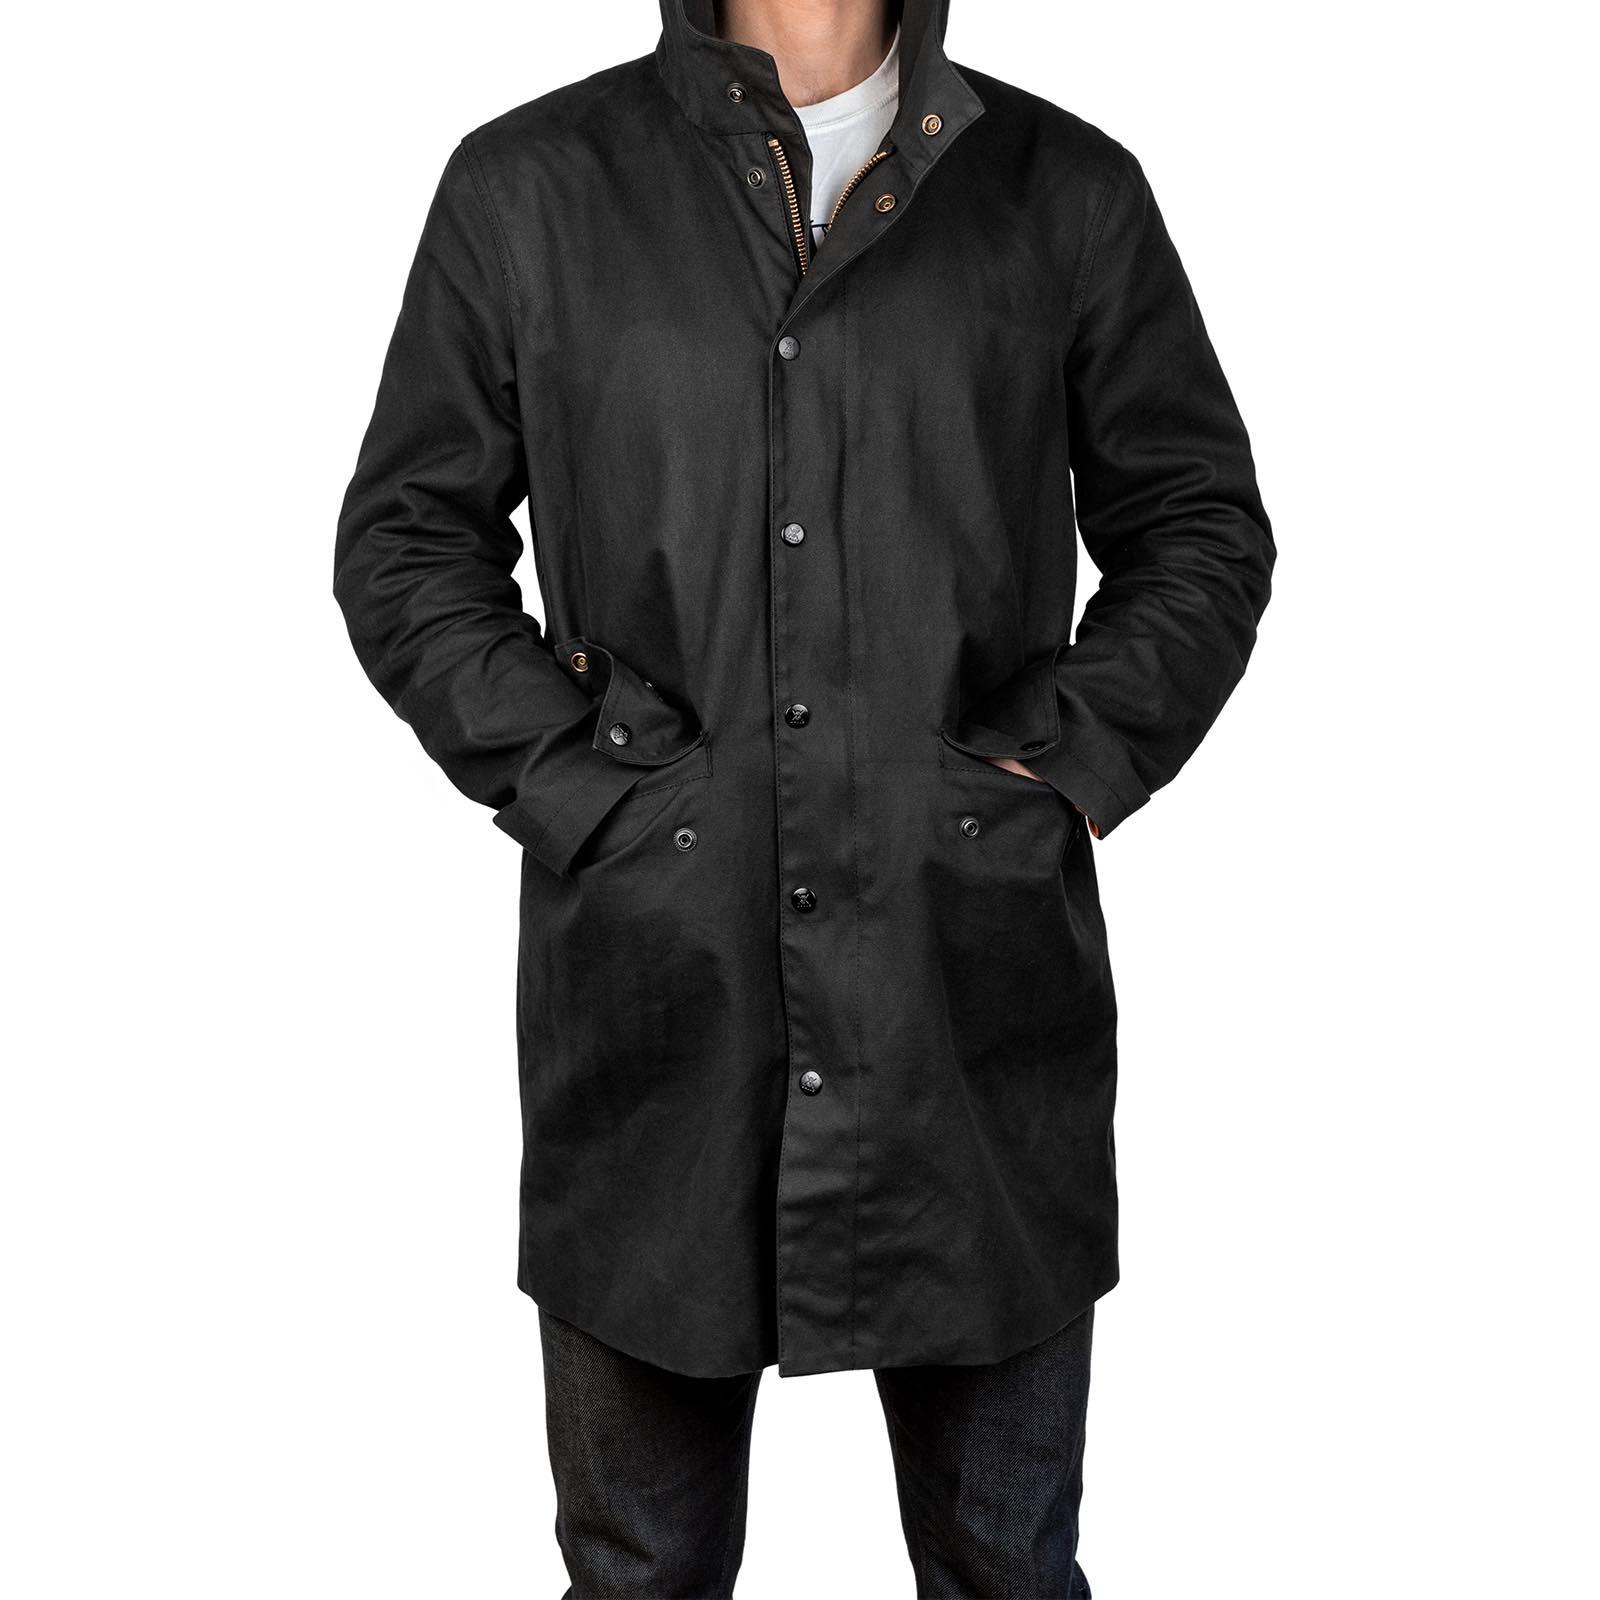 05599476957 Malle Mens Parka Coat